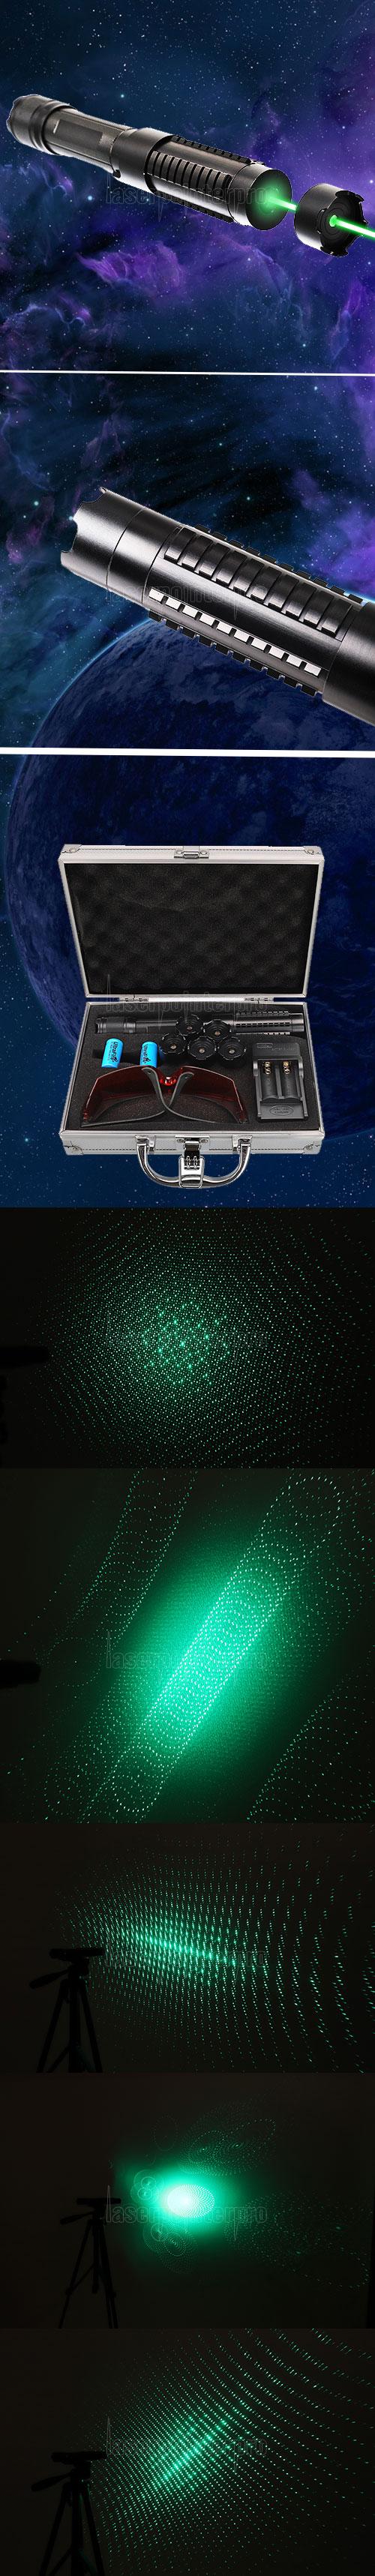 Kit puntatore laser verde bruciante ad alta potenza da 10000mw 520nm